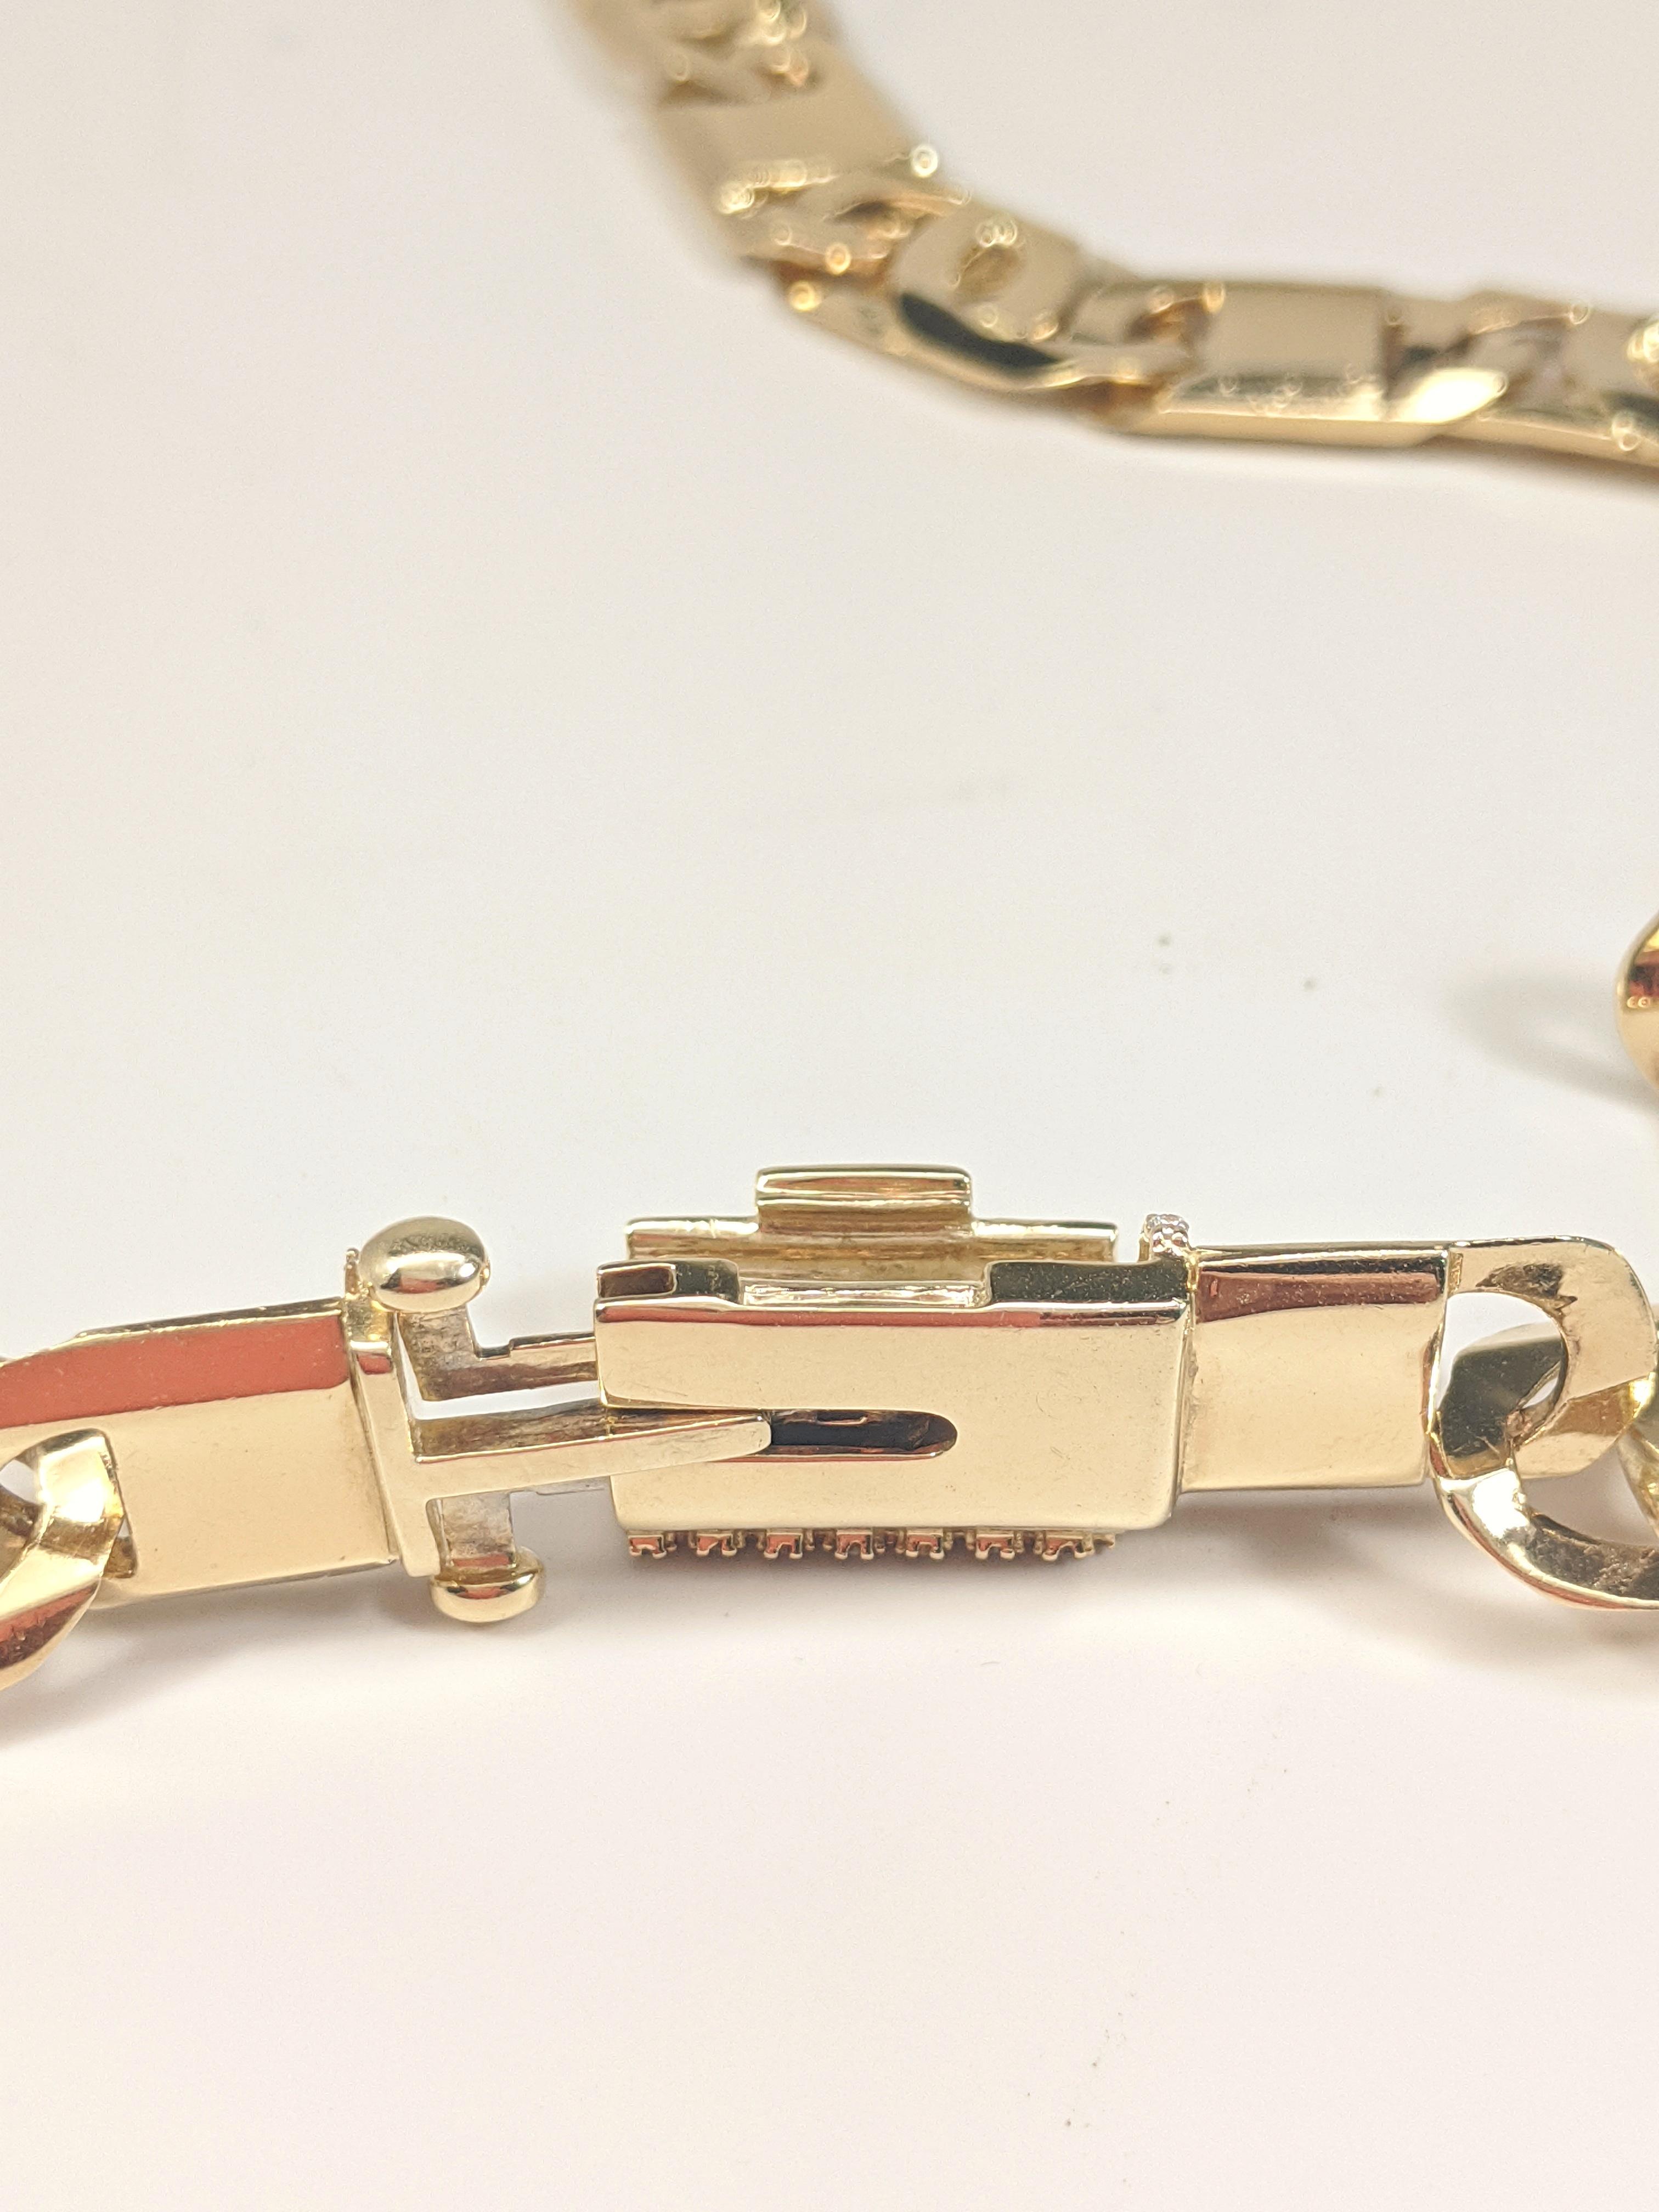 14KT Yellow Gold Solid Heavy Fancy Tiger Eye Link Chain, Hand Made Italian Chain 12MM wide, VVS Pave Diamond Lock, Cuban Box Lock, Open Lock Rear View